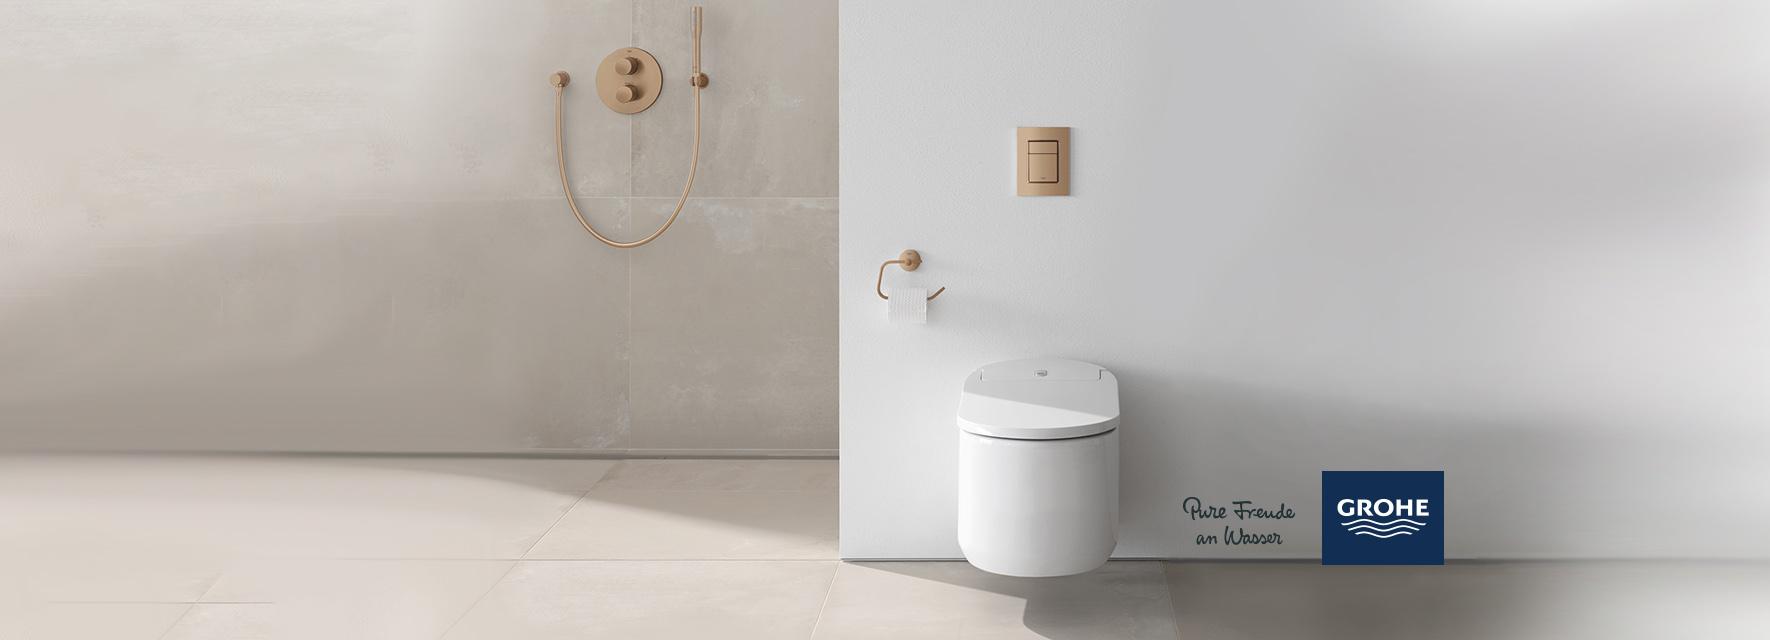 grohe sensia arena siko koupelny kuchyn. Black Bedroom Furniture Sets. Home Design Ideas